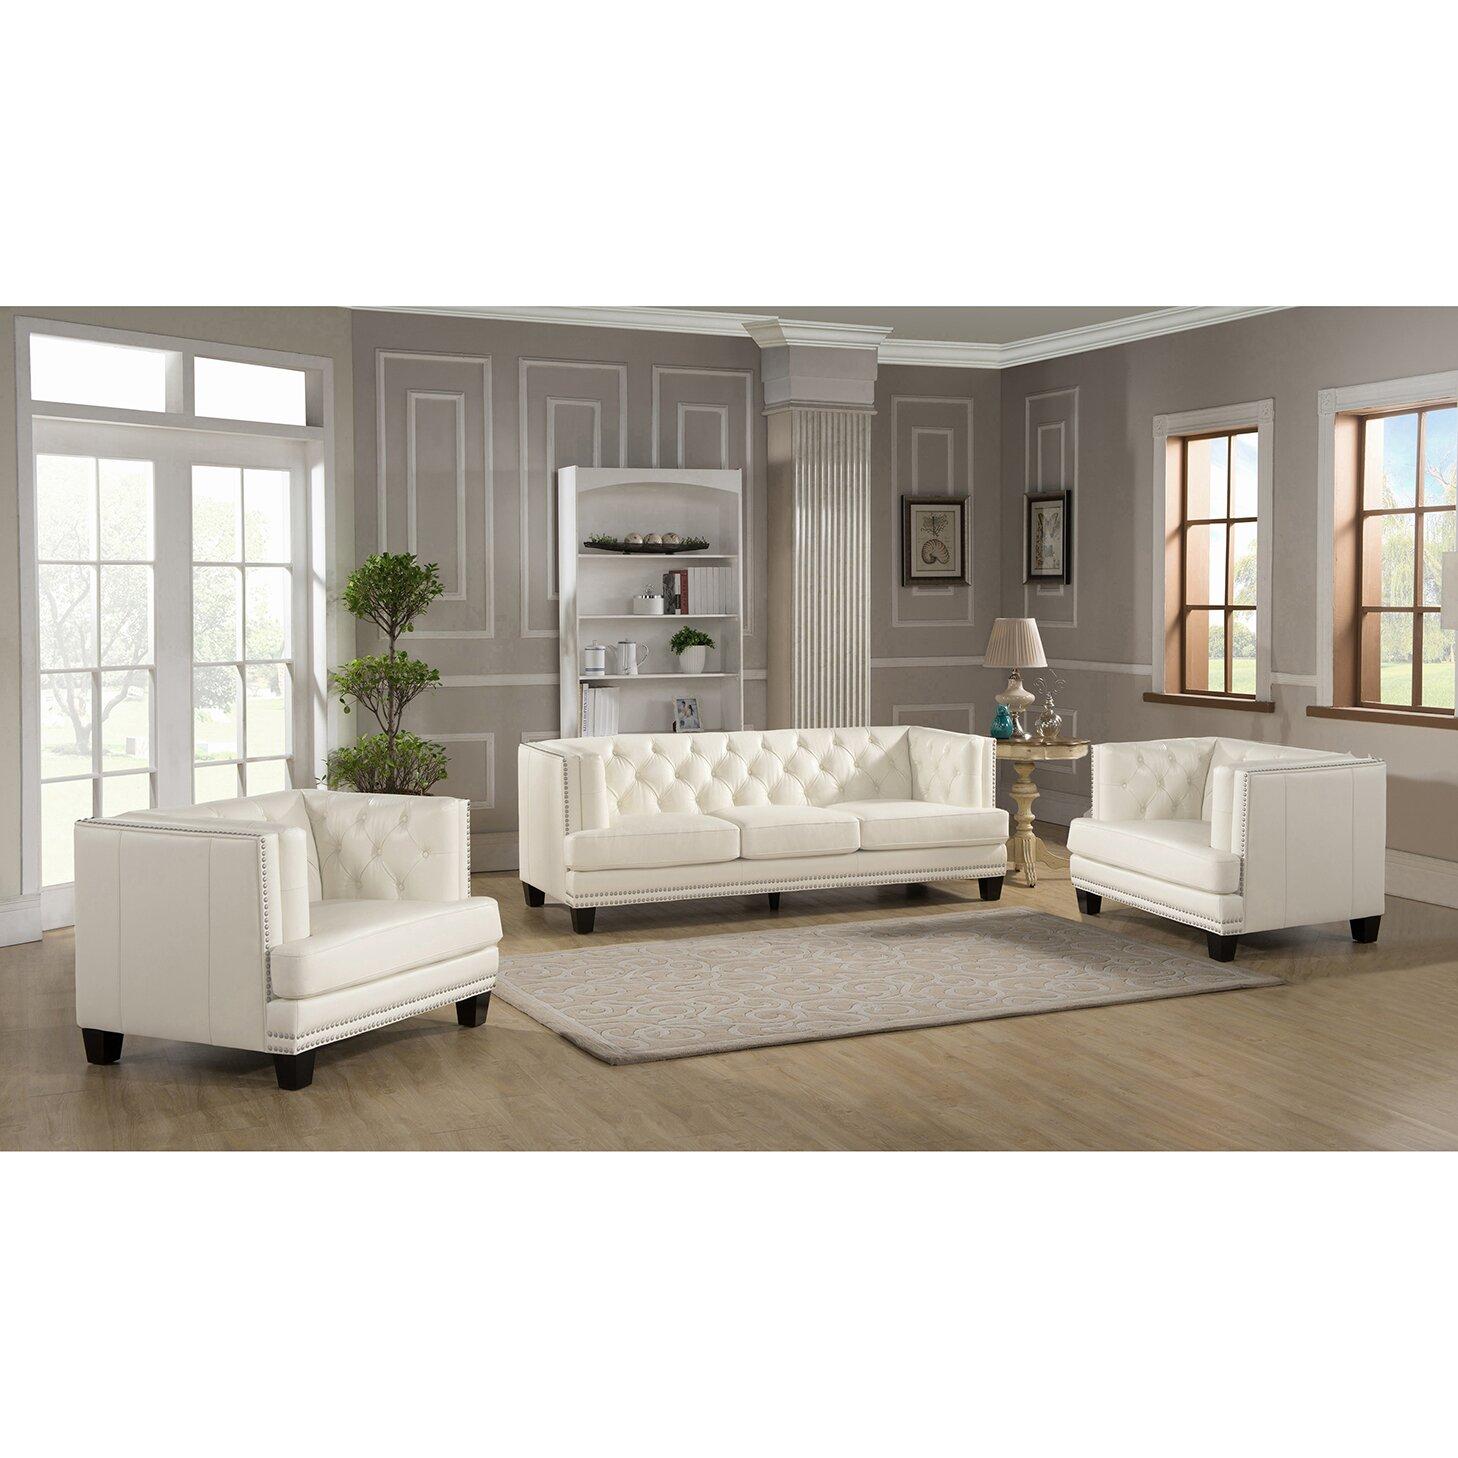 Amax newport 3 piece leather living room set reviews for Three piece leather living room set